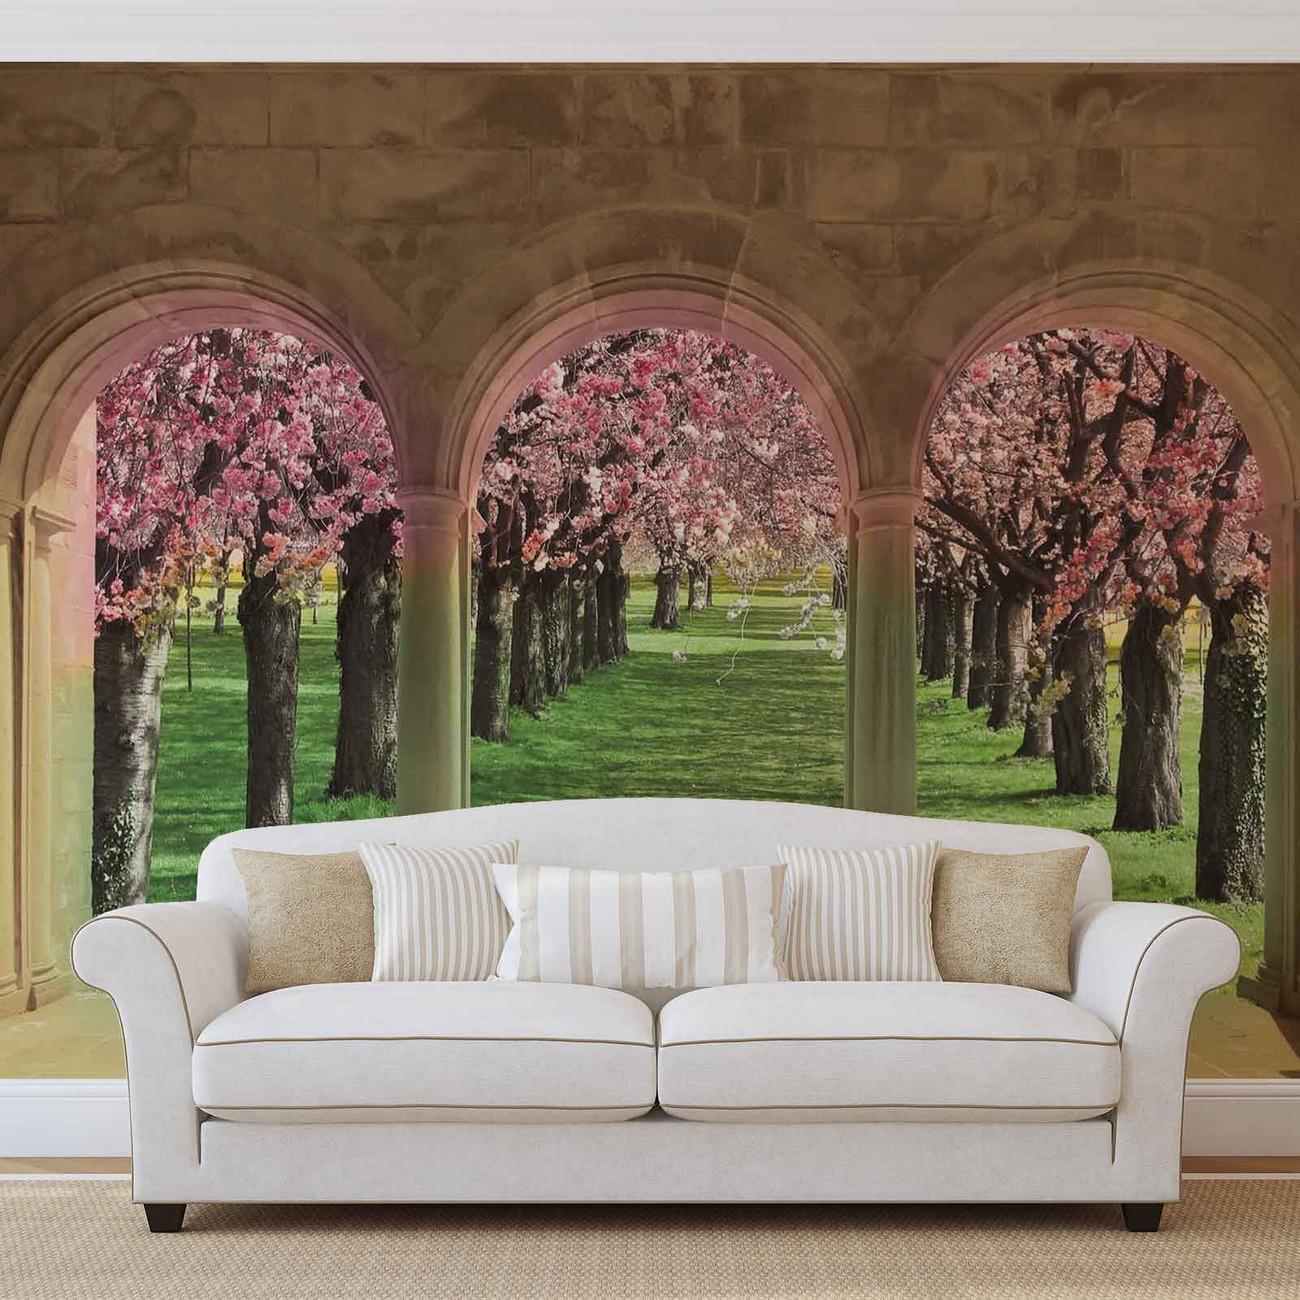 fototapete tapete blumen b ume natur bei europosters. Black Bedroom Furniture Sets. Home Design Ideas